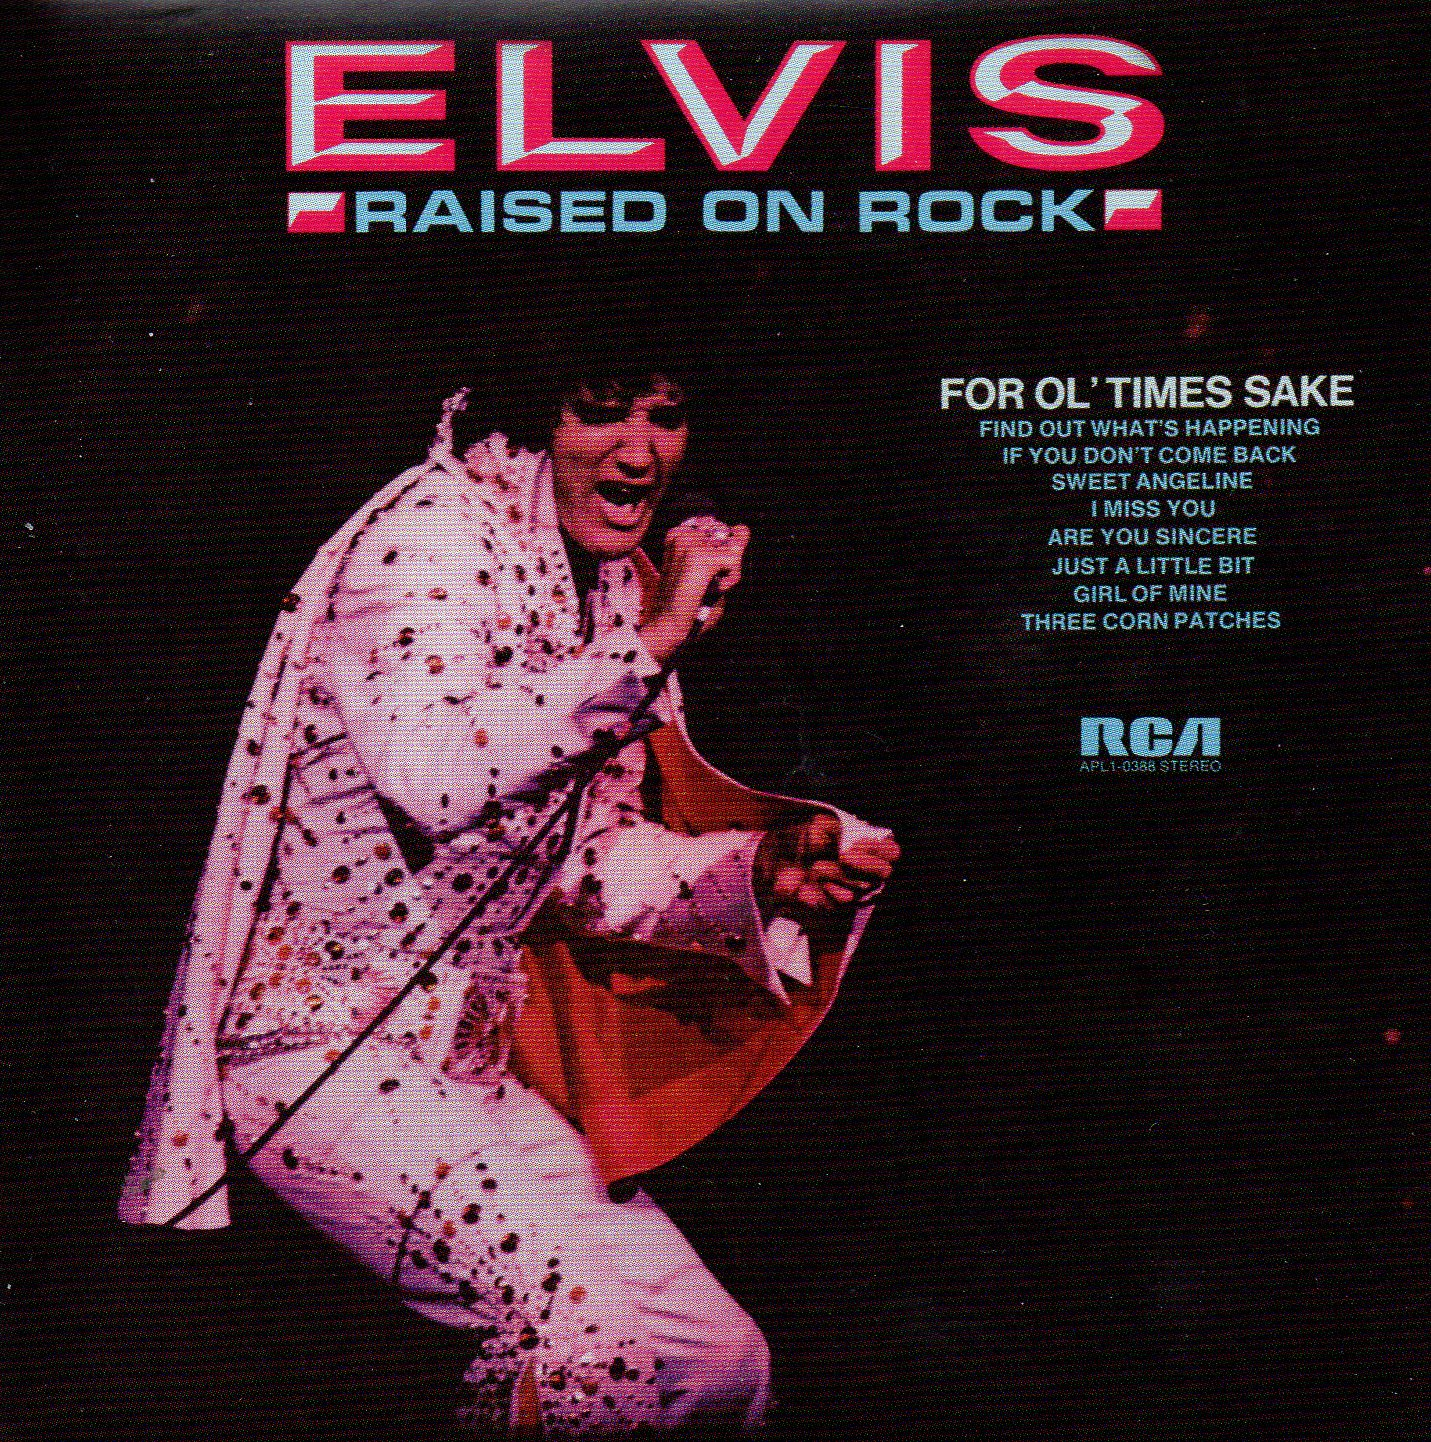 ELVIS PRESLEY - Raised On Rock / For Ol' Times Sake  (1973) - Mini LP REPLICA - 10-track CARD SLEEVE - CD